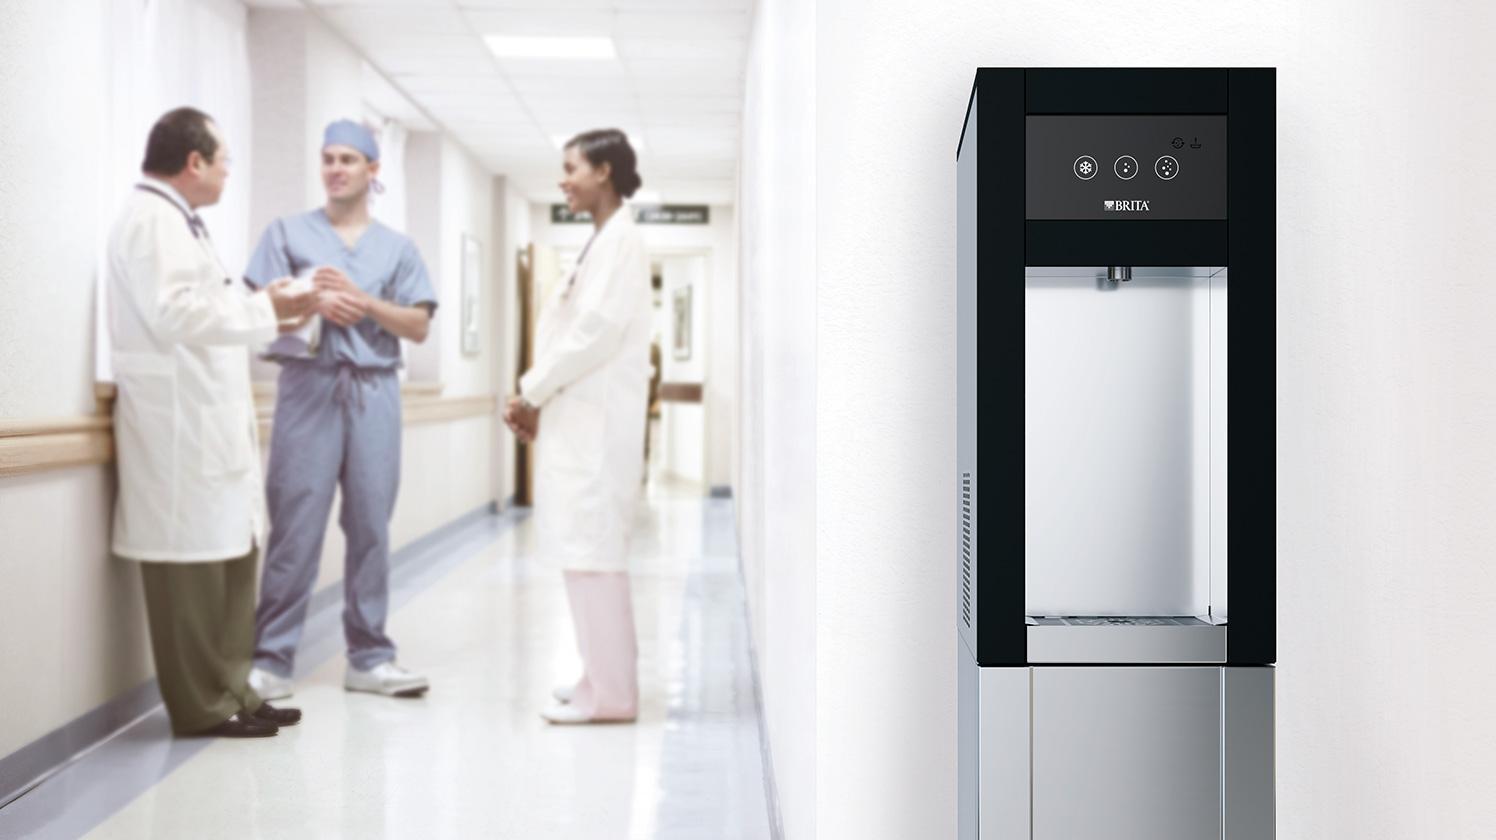 BRITA filter CLARITY Protect couloir d'hôpital